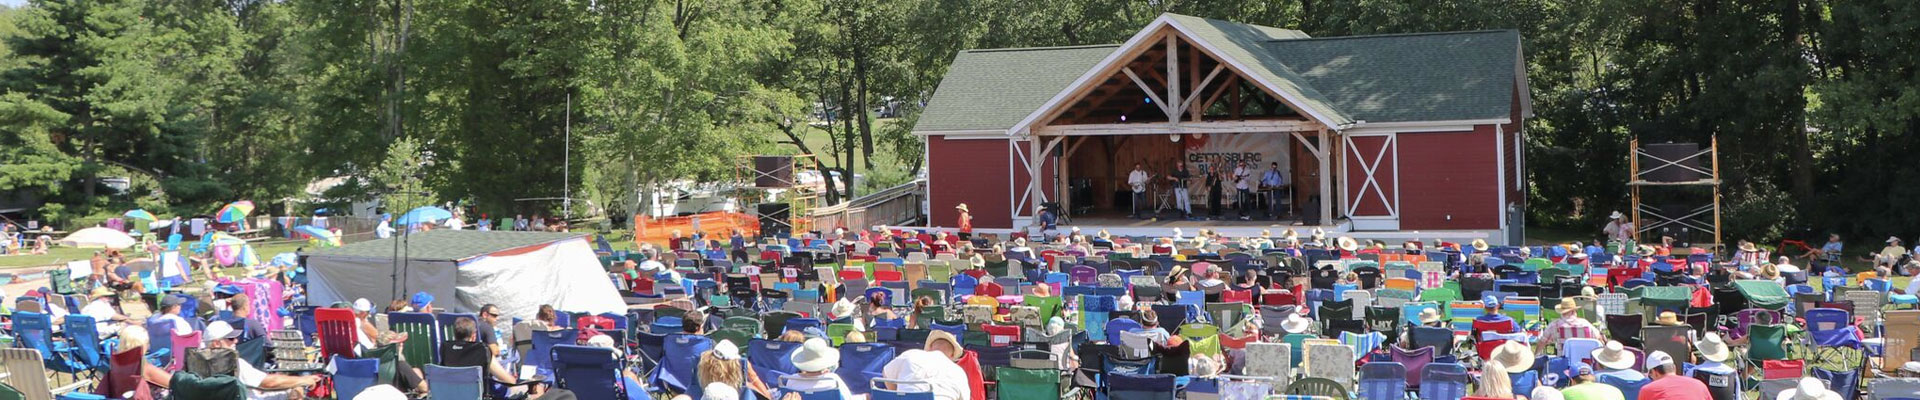 gettysburg-bluegrass-festival